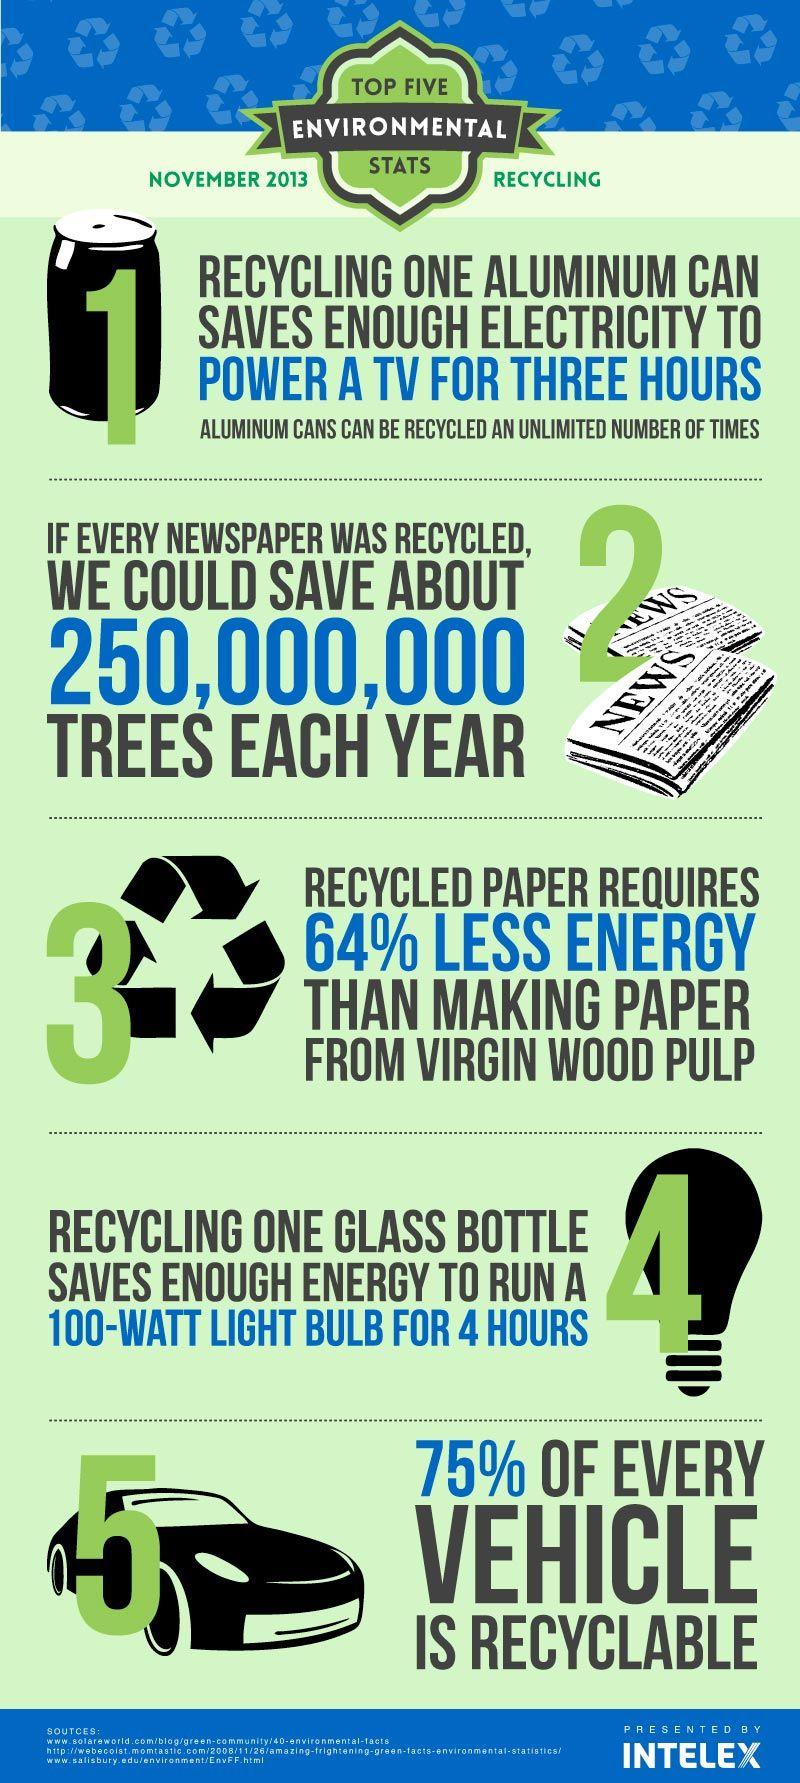 environmental education resources | environmental education